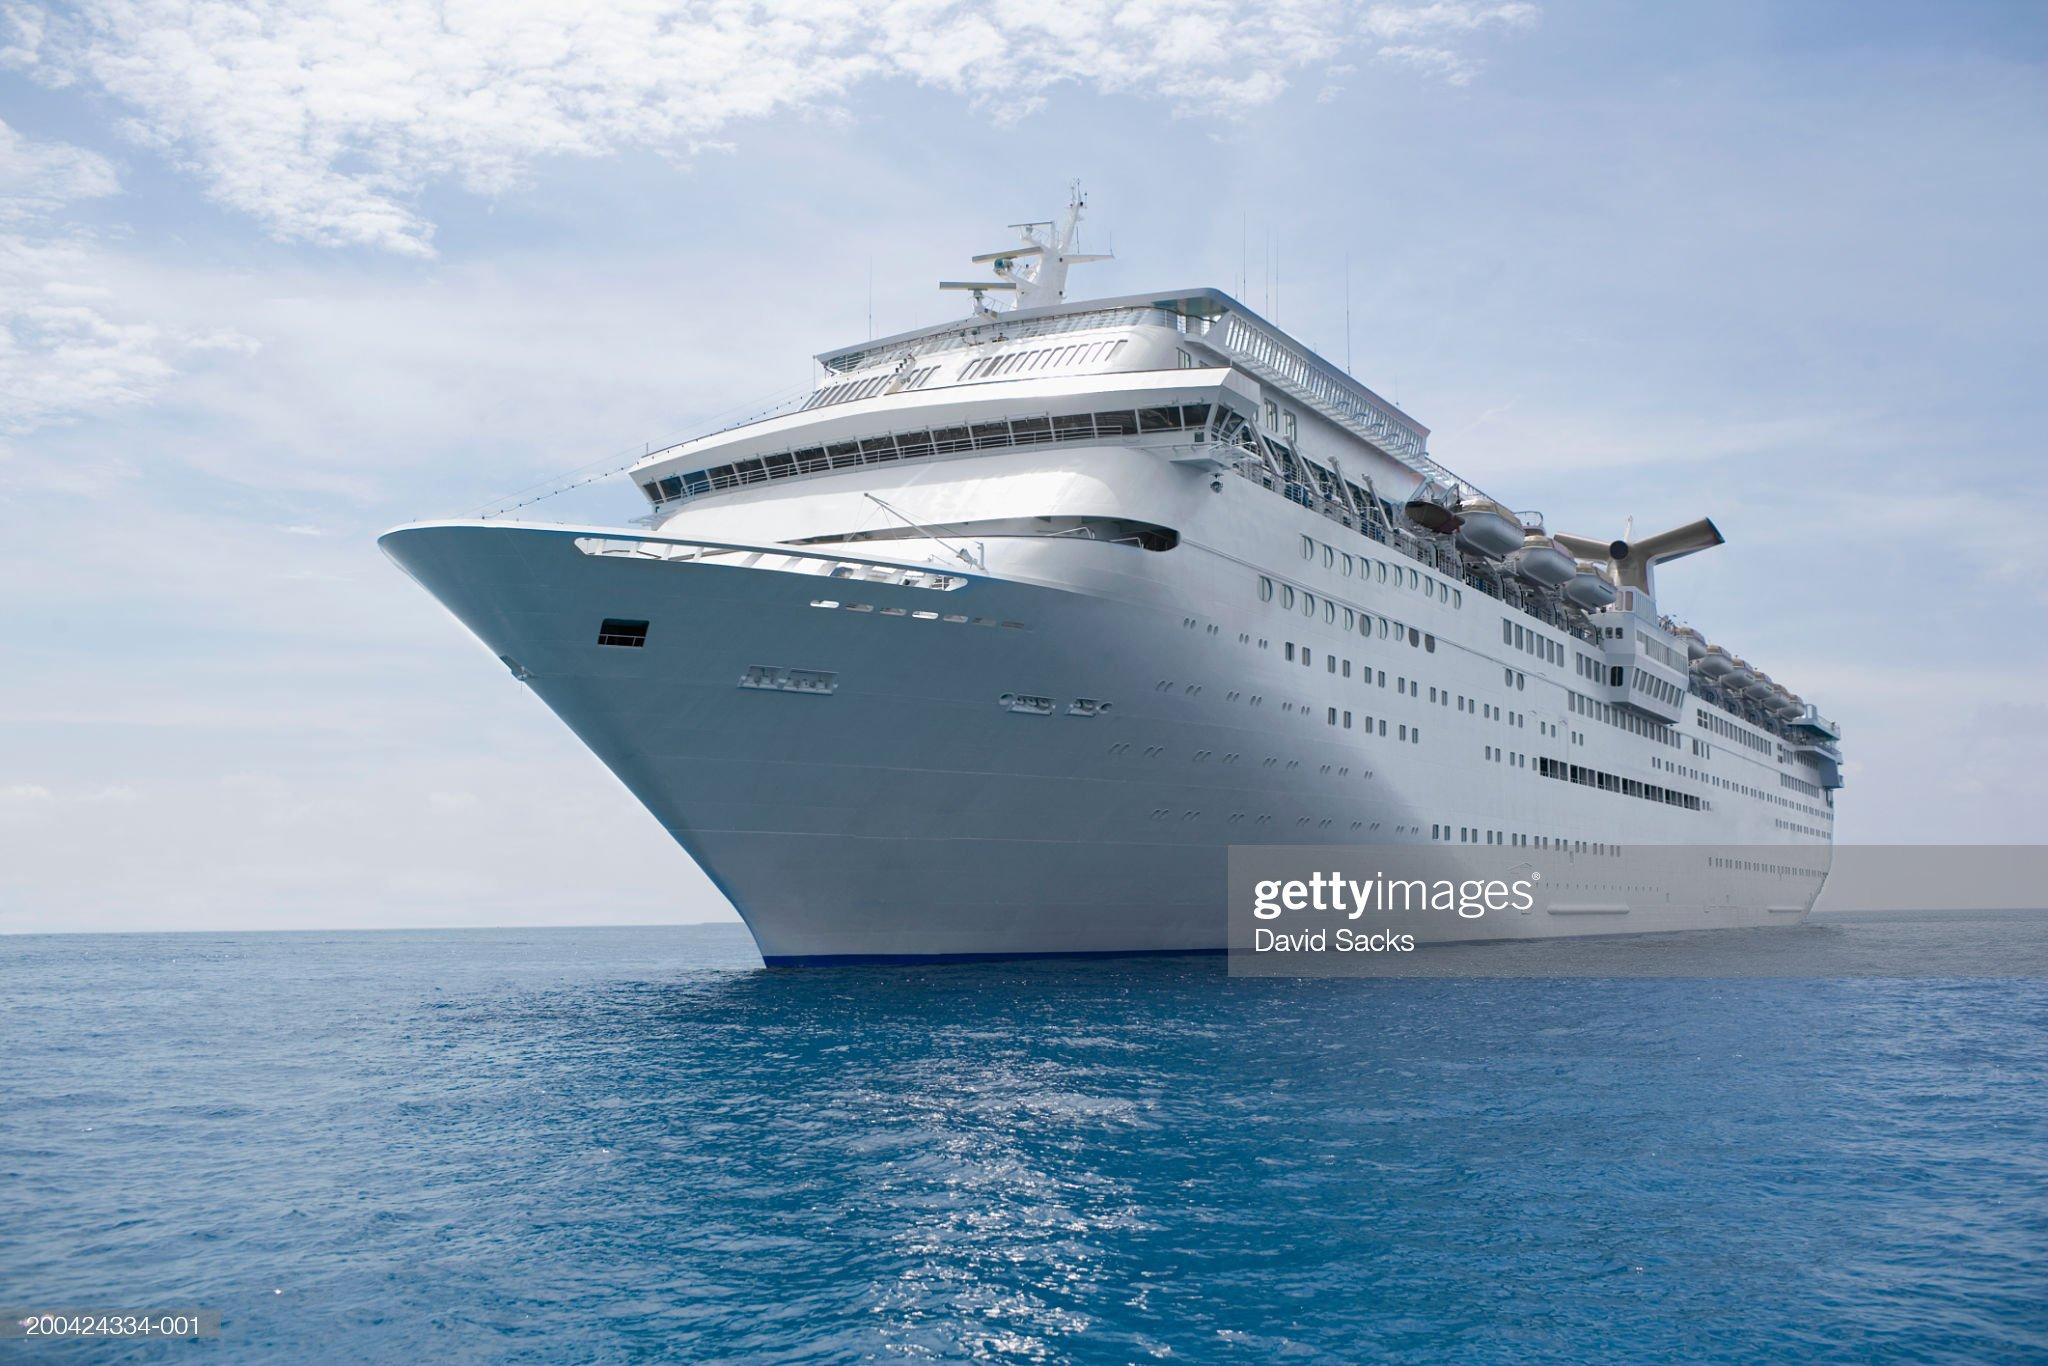 Cruise ship in caribbean sea : Stock Photo